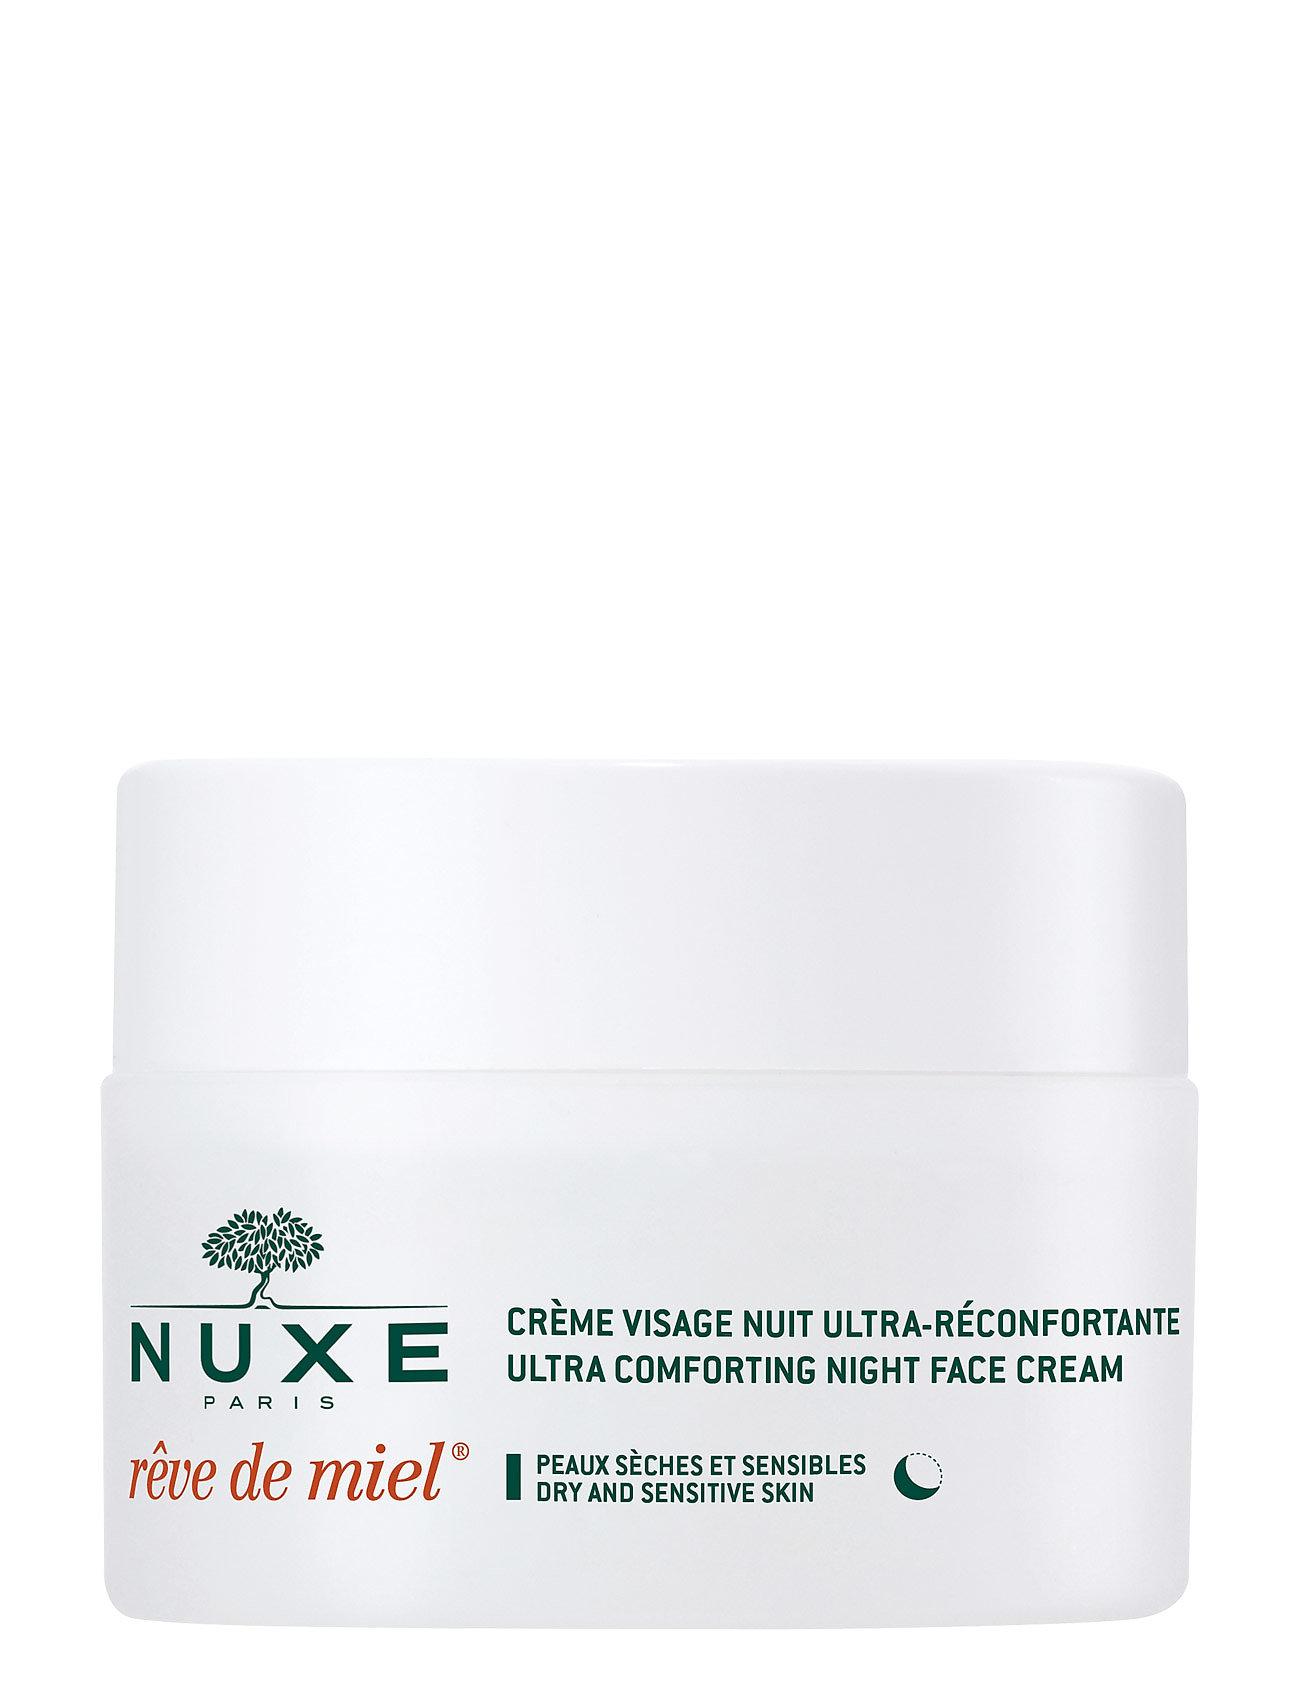 nuxe – Ultra comforting night face cream rãªve de miel på boozt.com dk